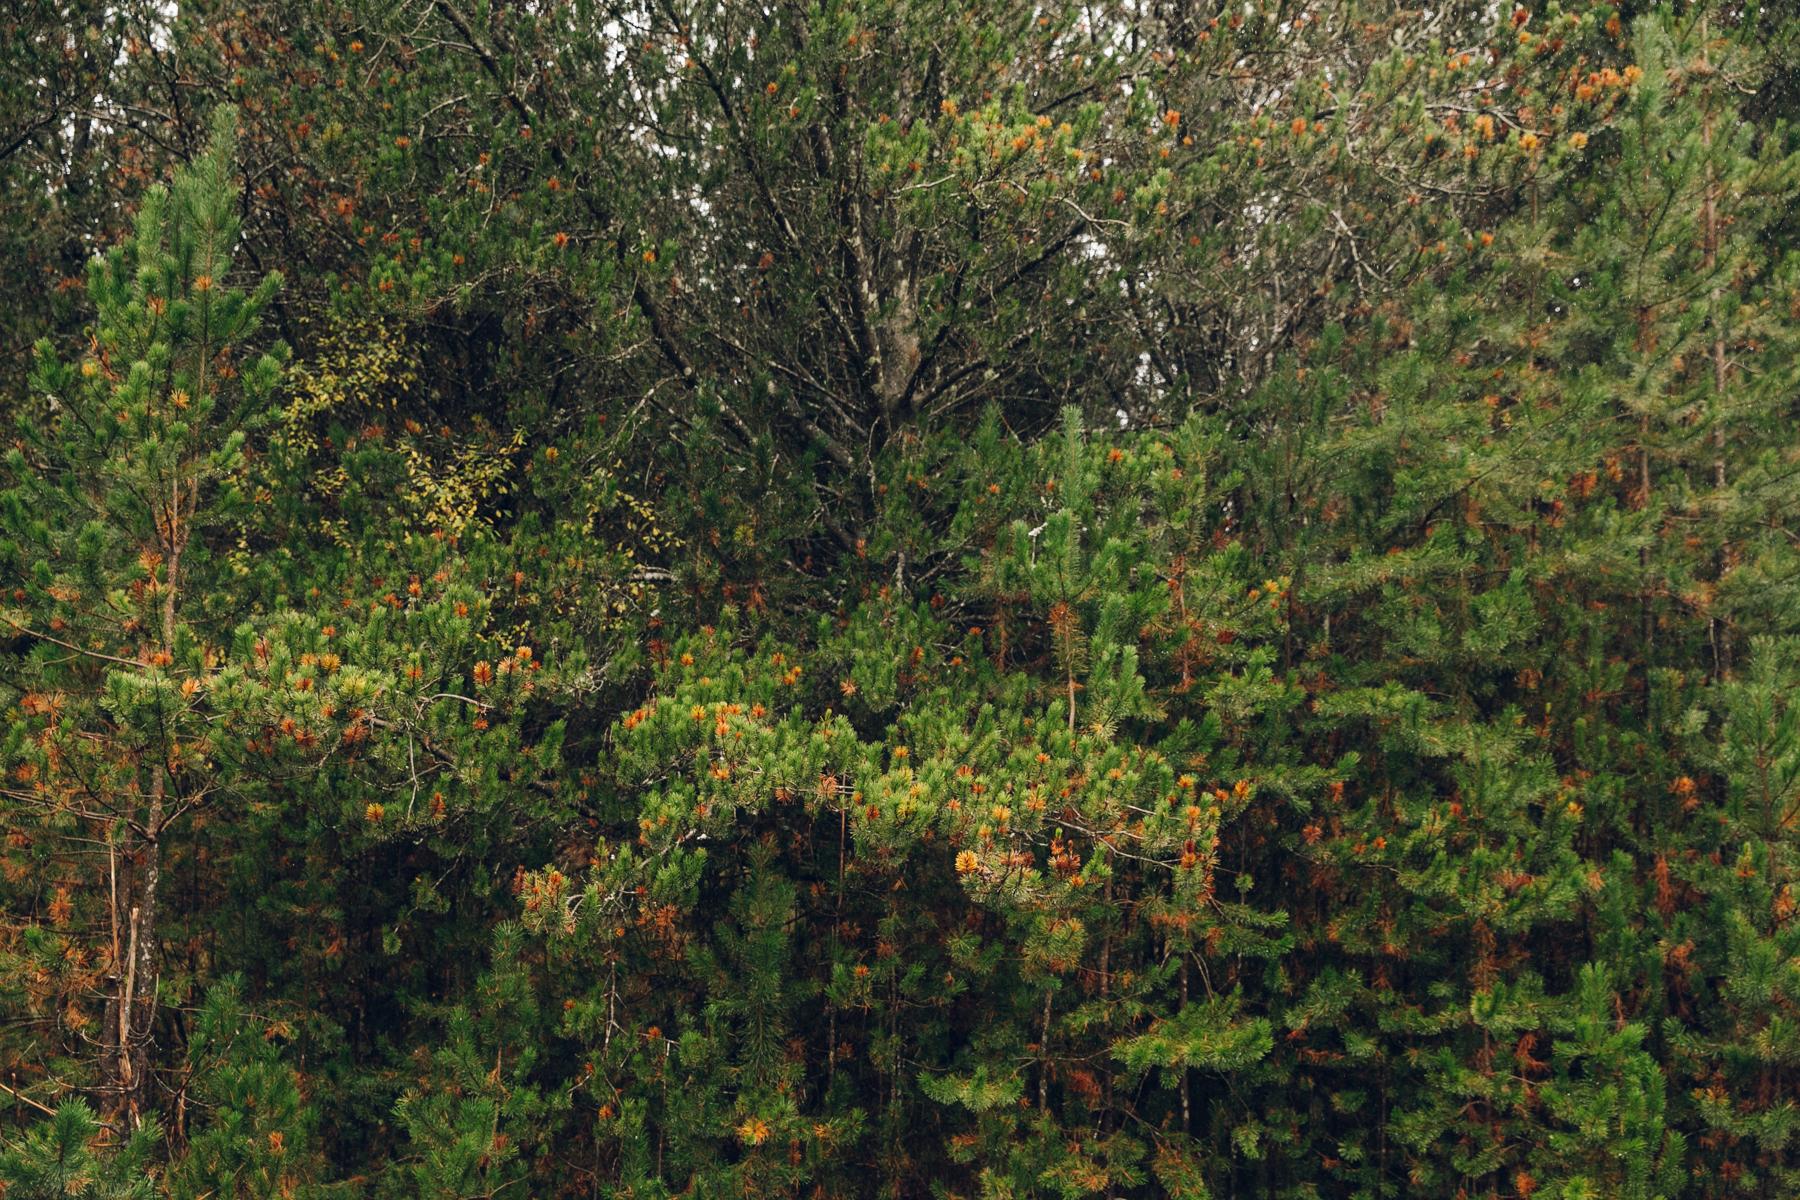 Green woodland textures.